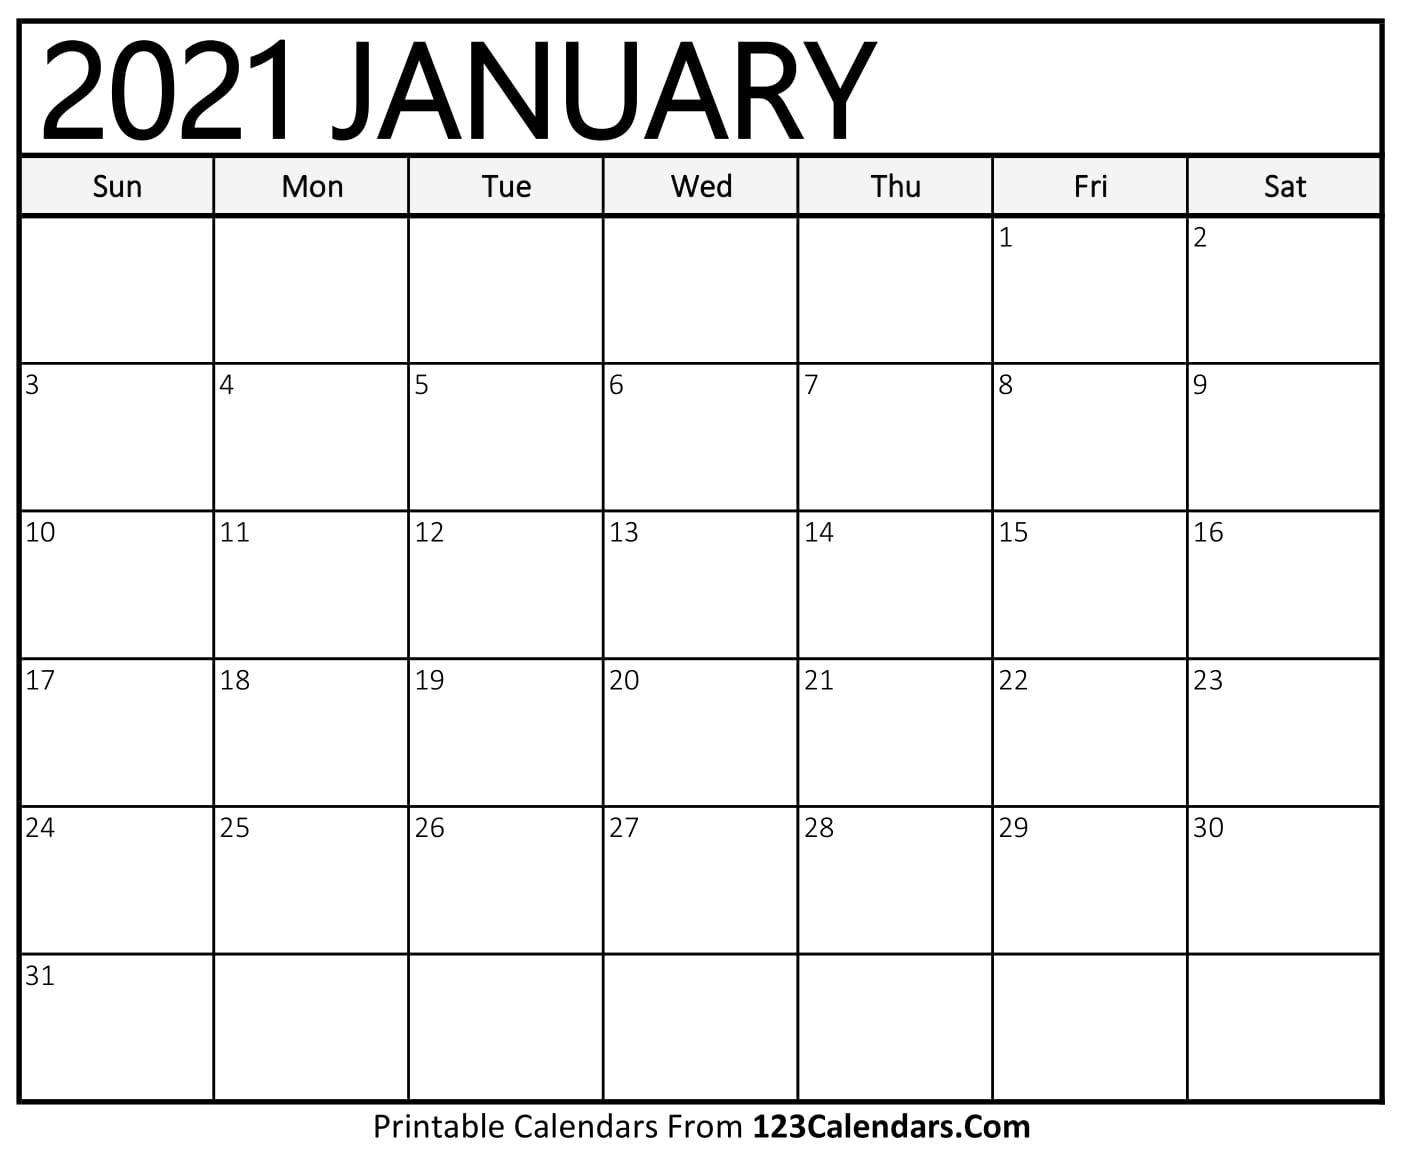 Calendar Of Just Weekends For 2021 | Calendar Printables